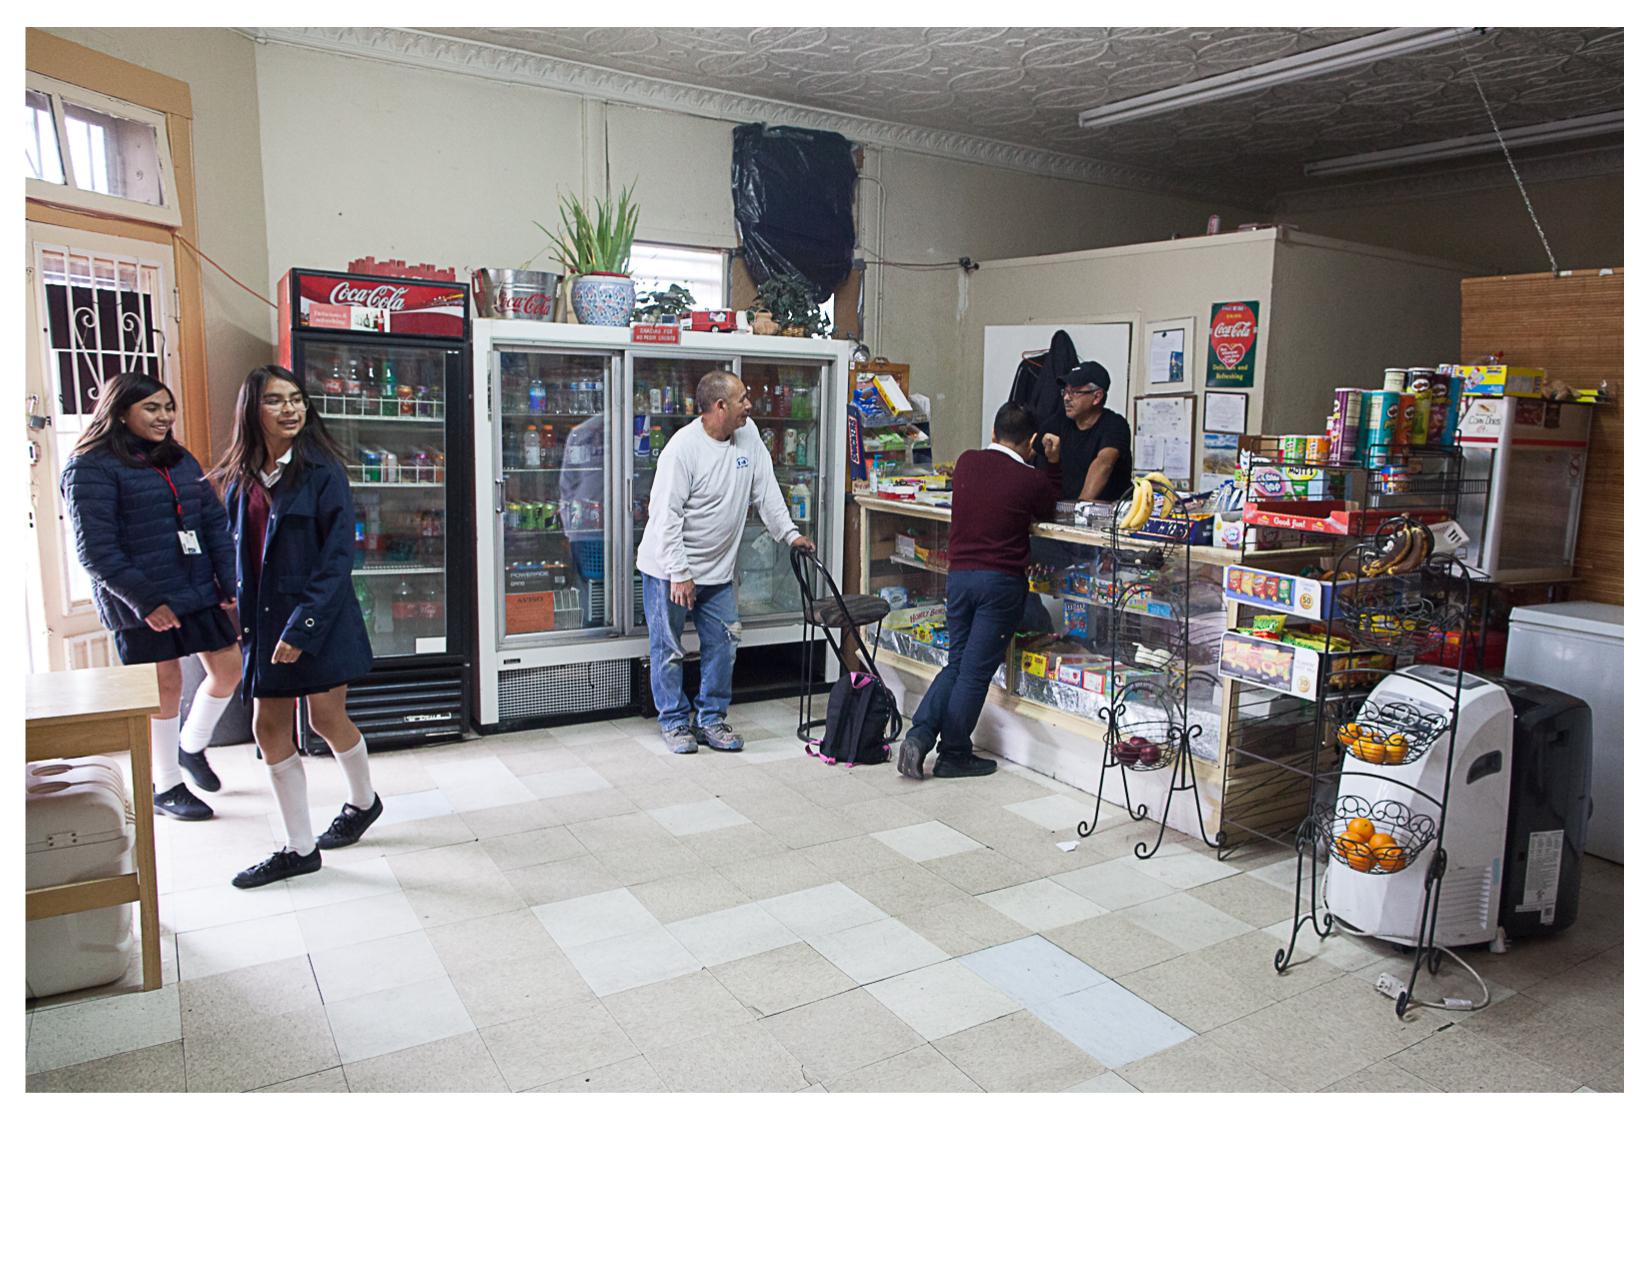 Inside Rivera Grocery after School, El Paso, TX